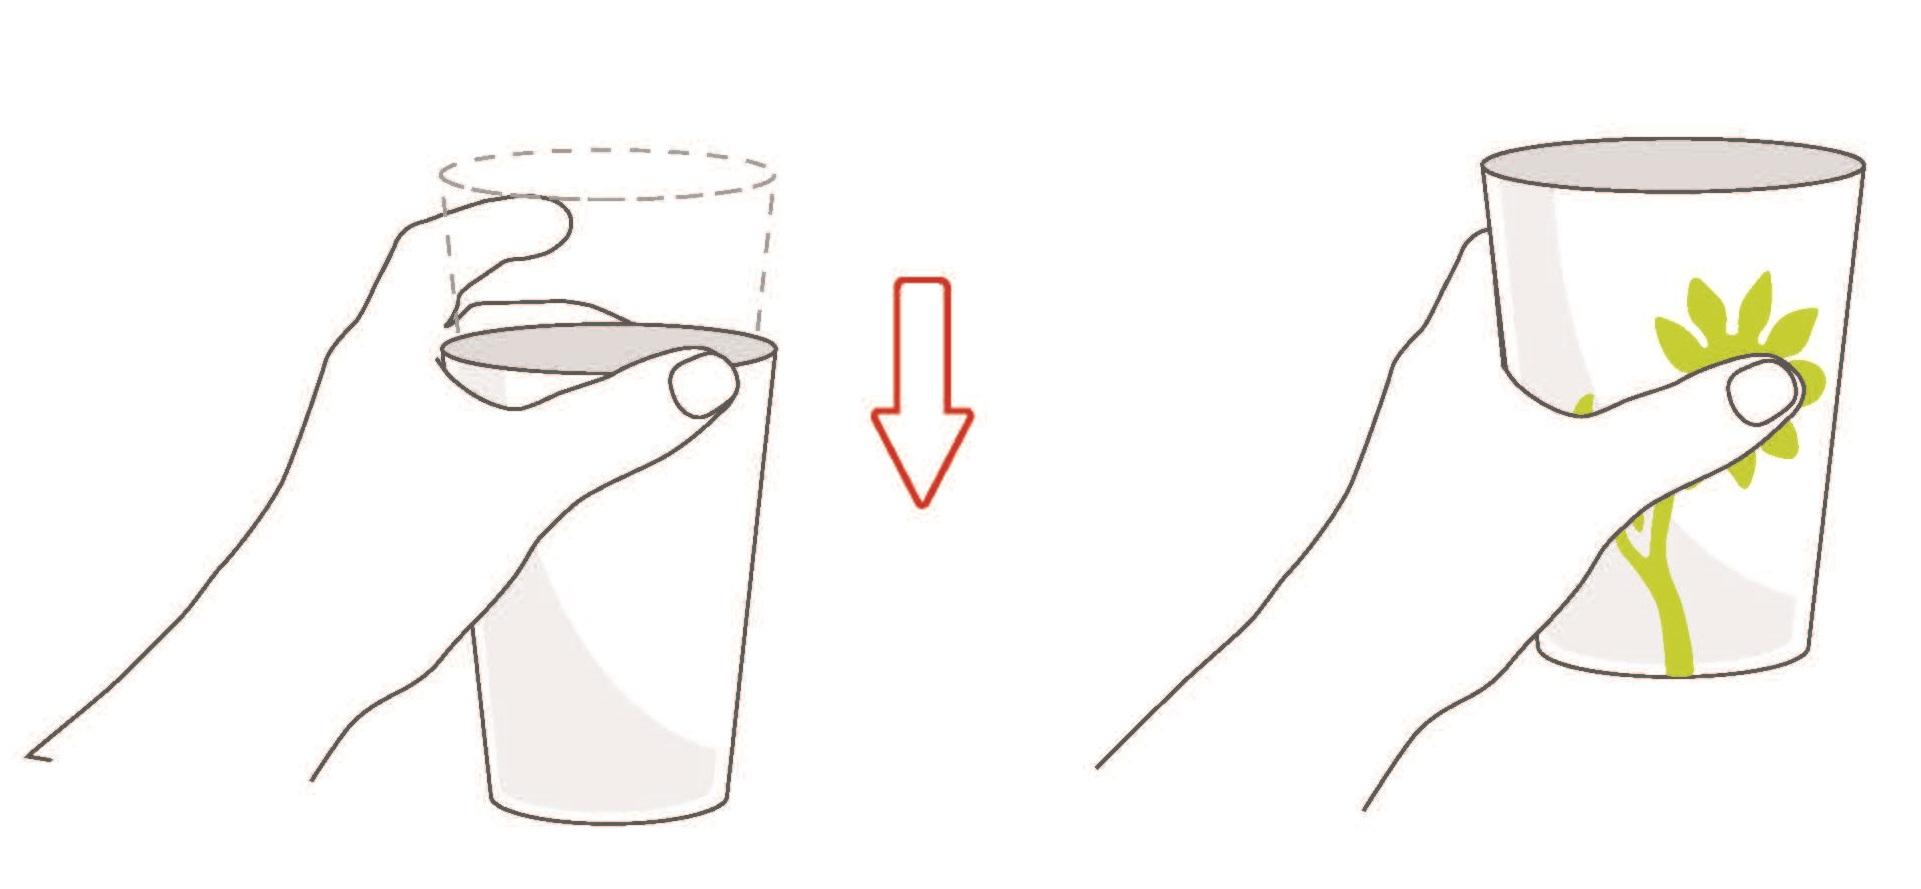 5-schema Gobelet antidérapant.jpg